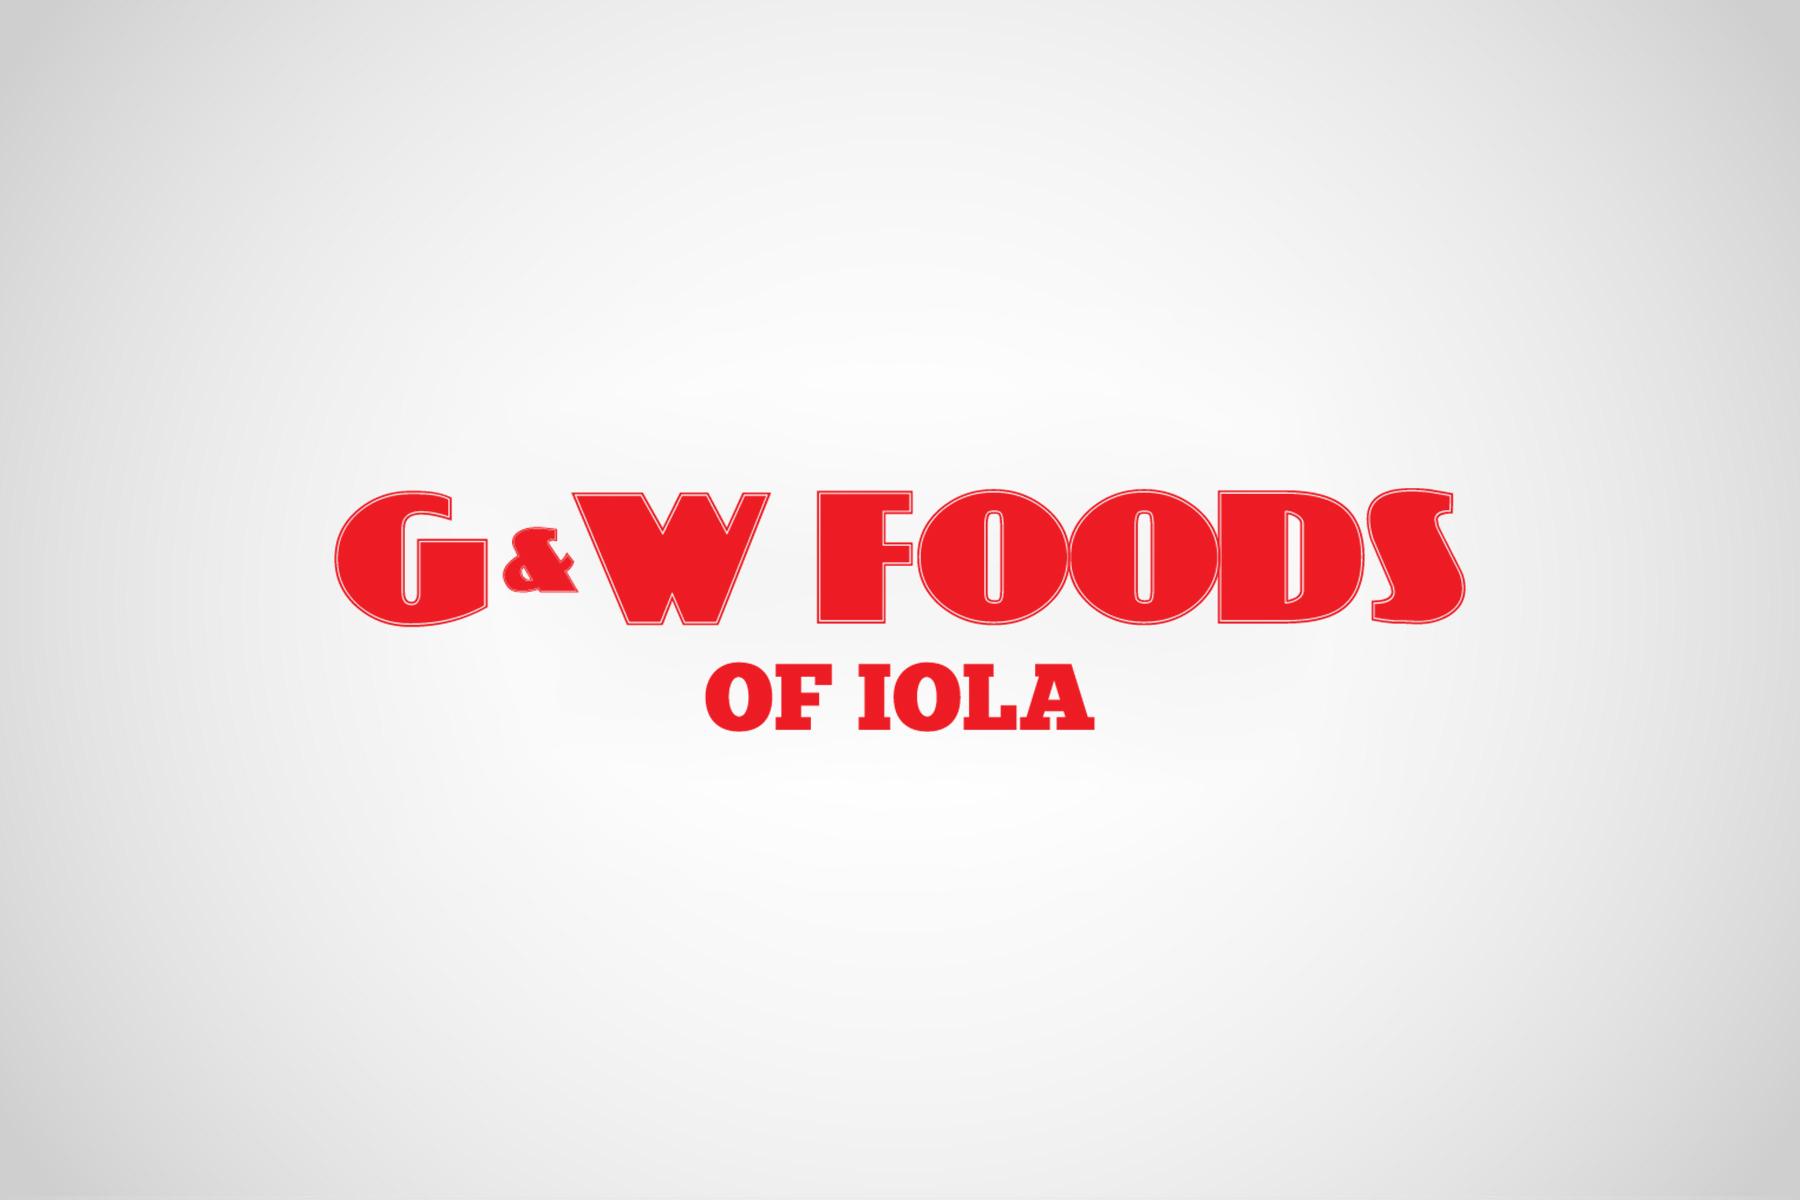 G&W Foods of Iola